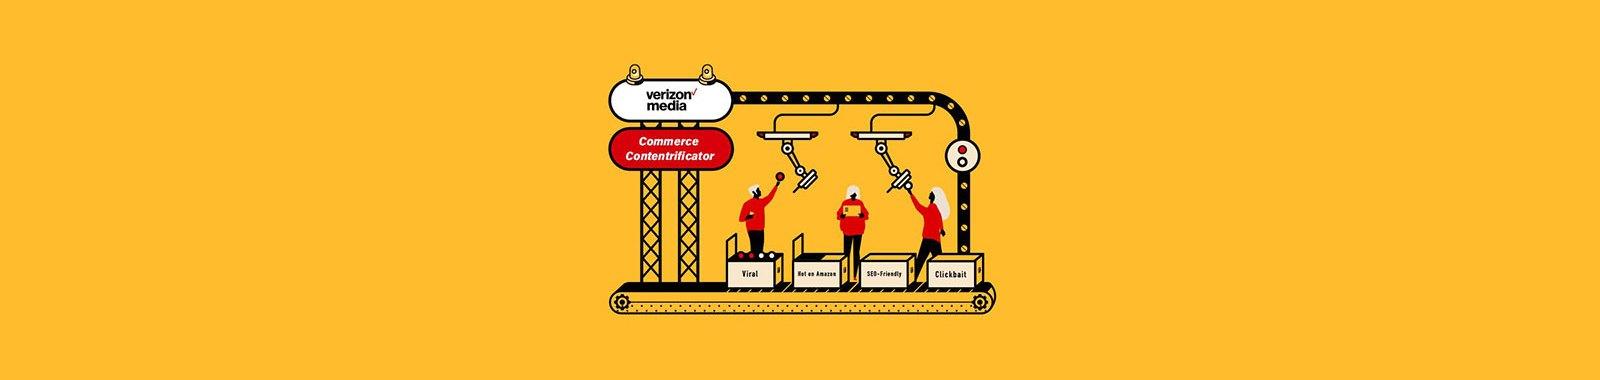 commerce-contentrificator_eye